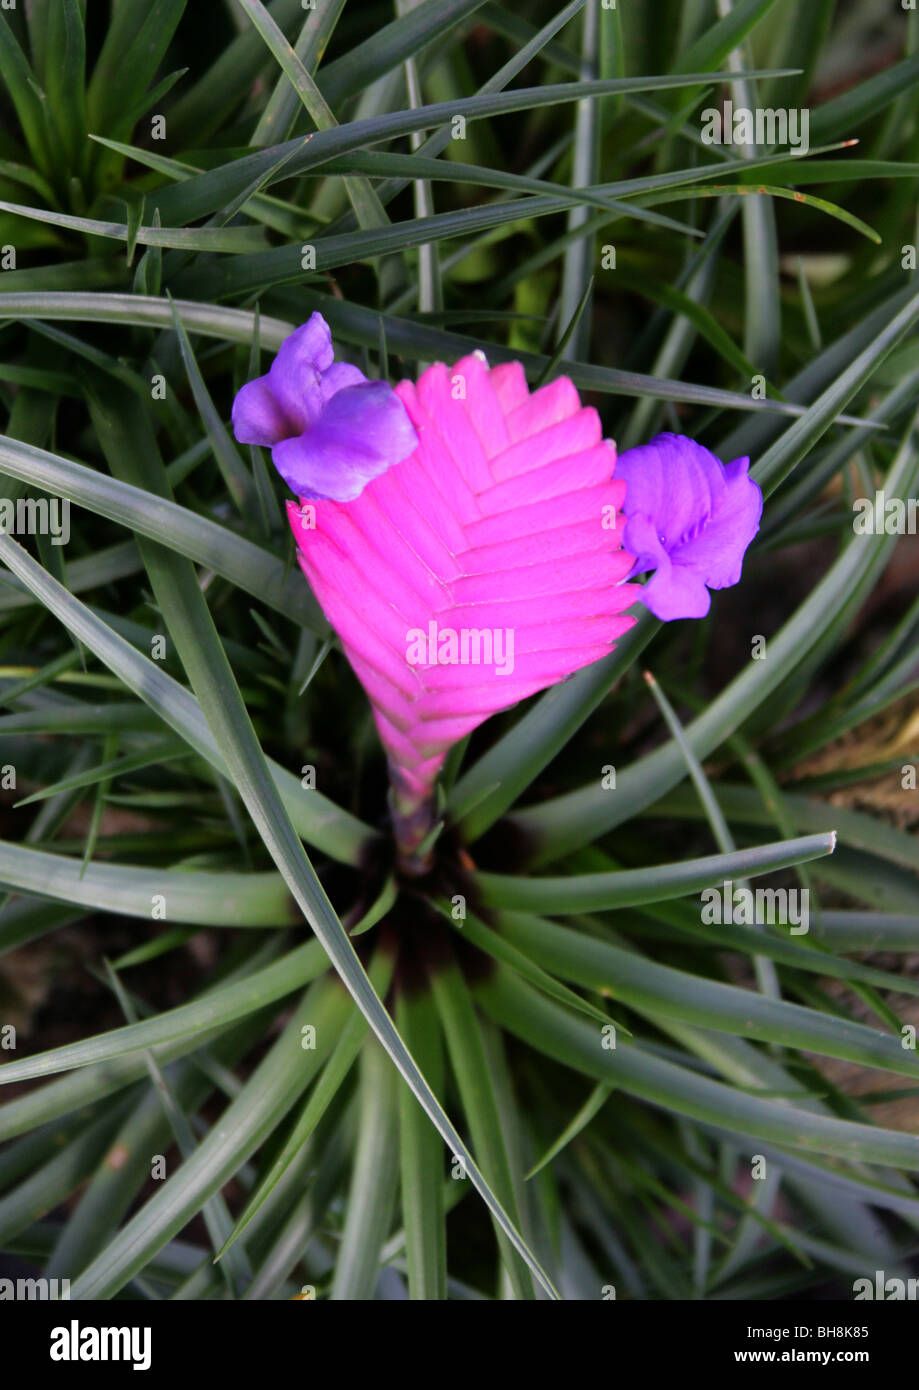 Tillandsia Cyanea Linden Ex K Koch: Pink Quill, Tillandsia Cyanea, Bromeliaceae, Ecuador